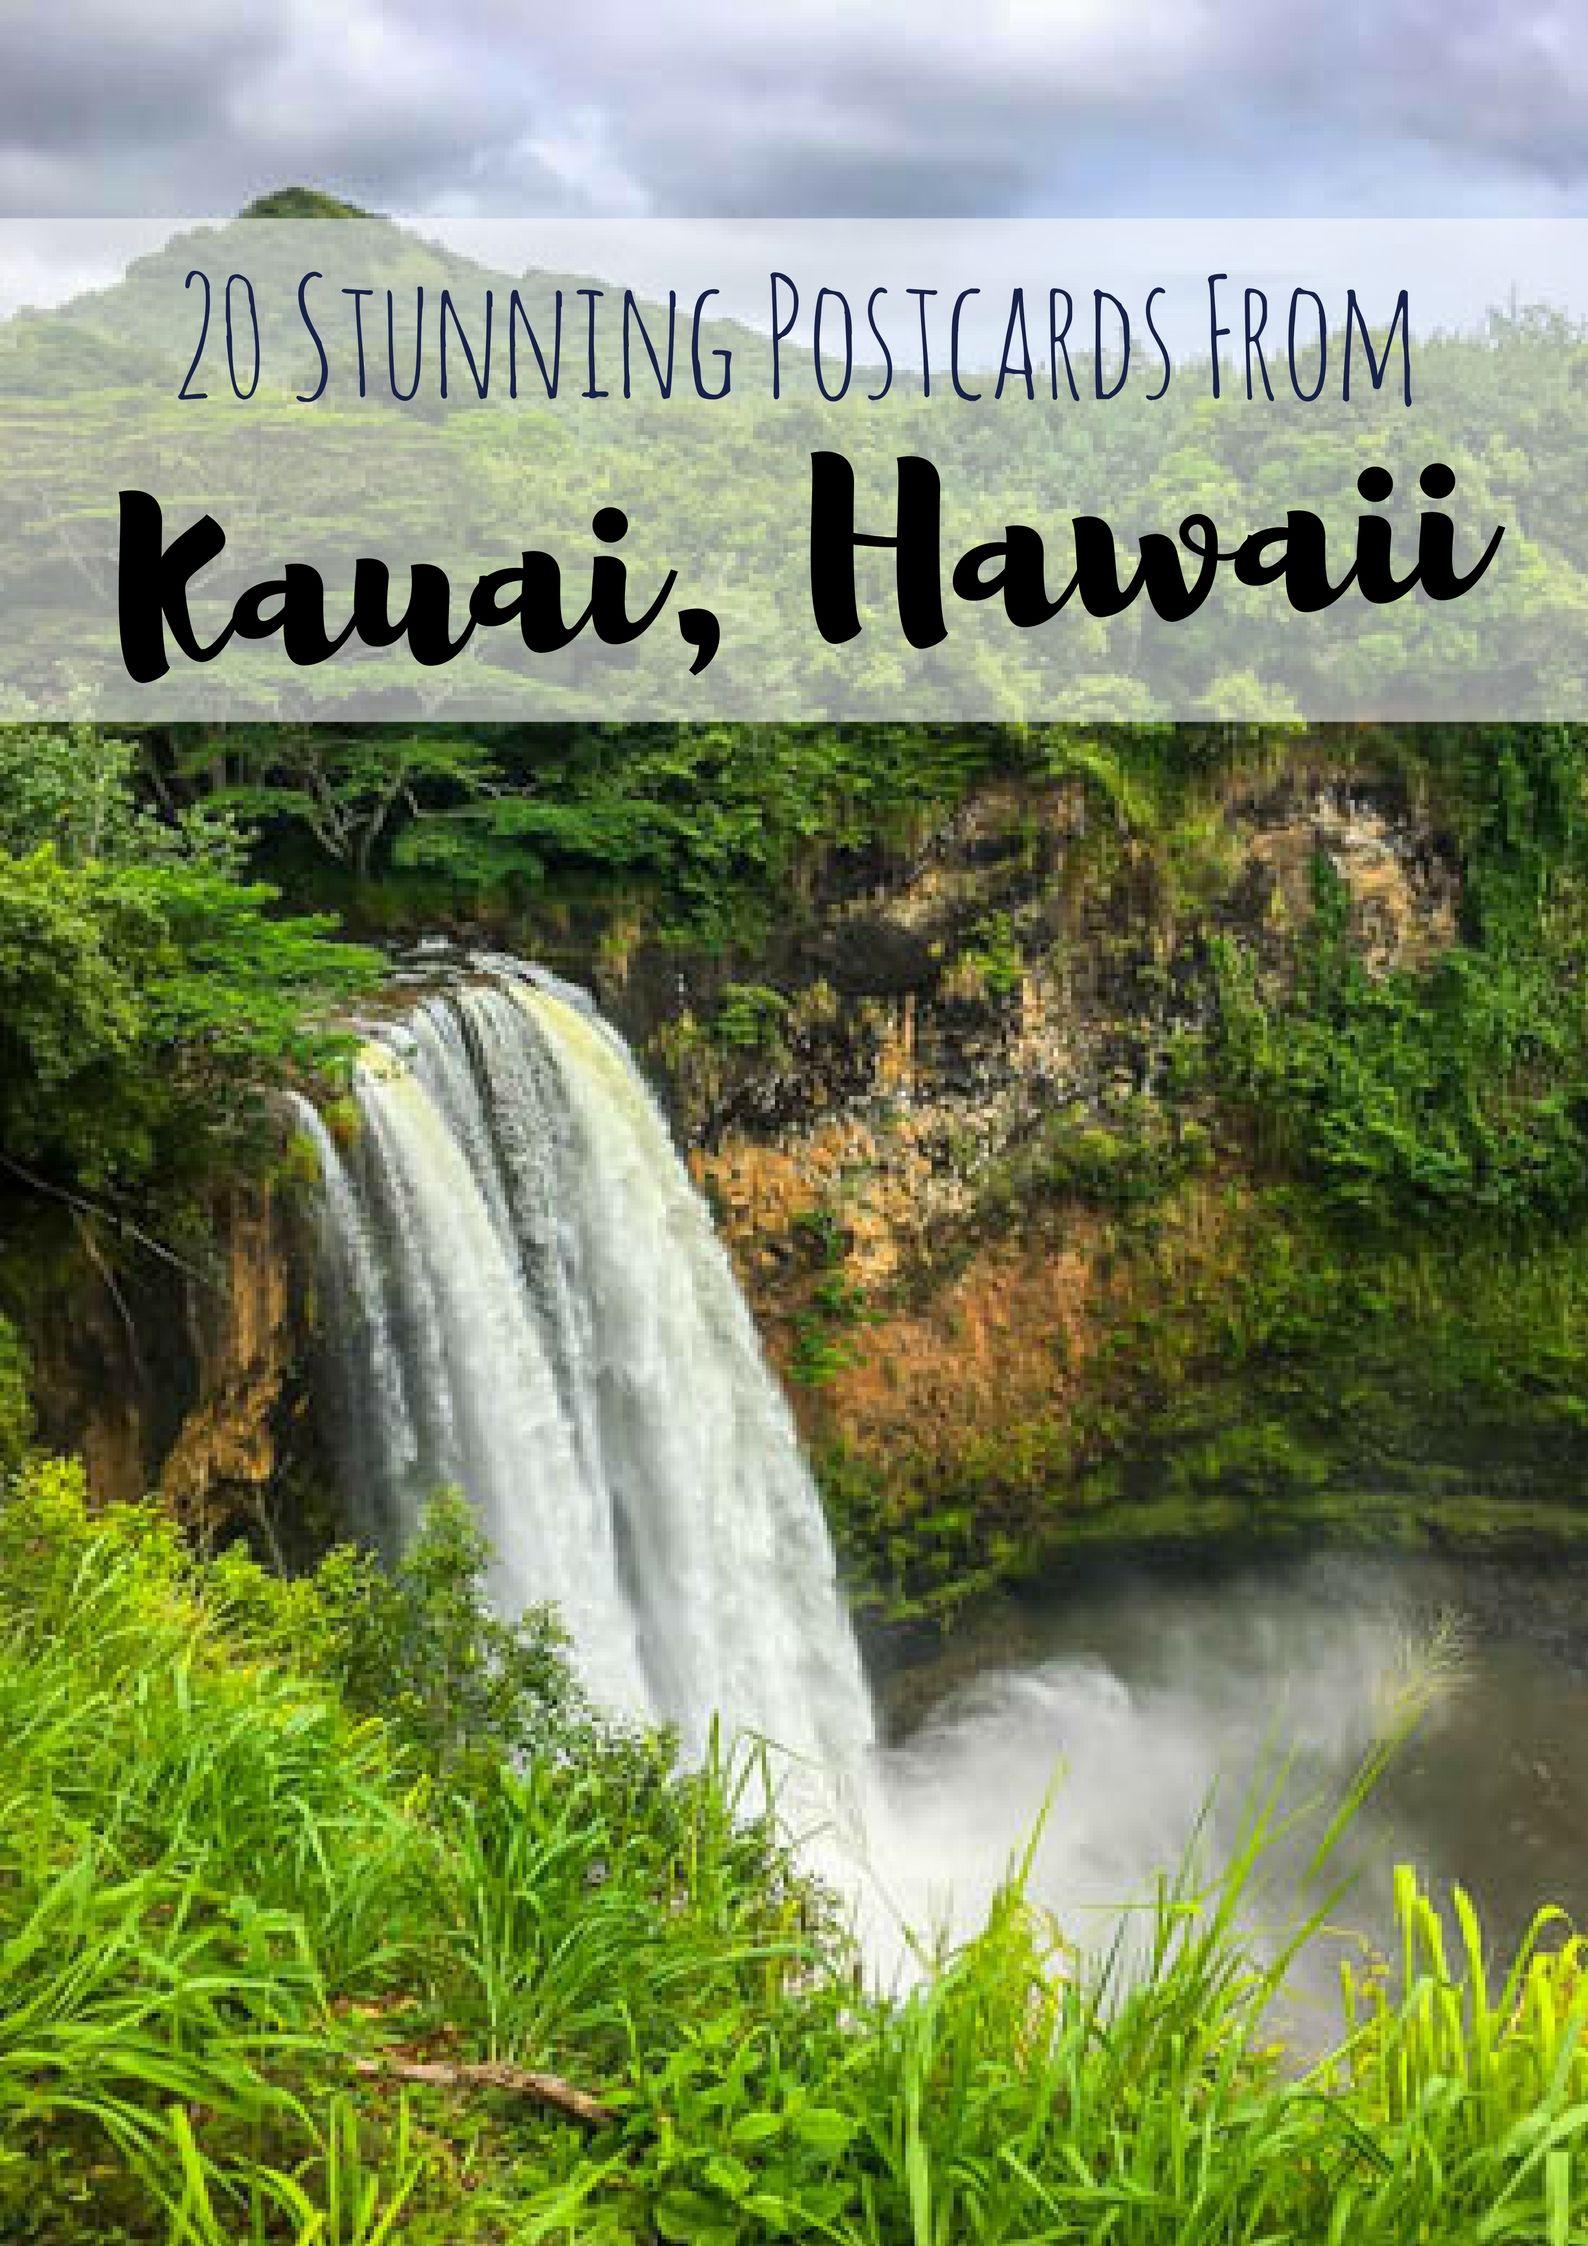 20 Postcards From The Garden Island Kauai Hawaii Hawaii Travel Guide Hawaii Travel Travel Usa